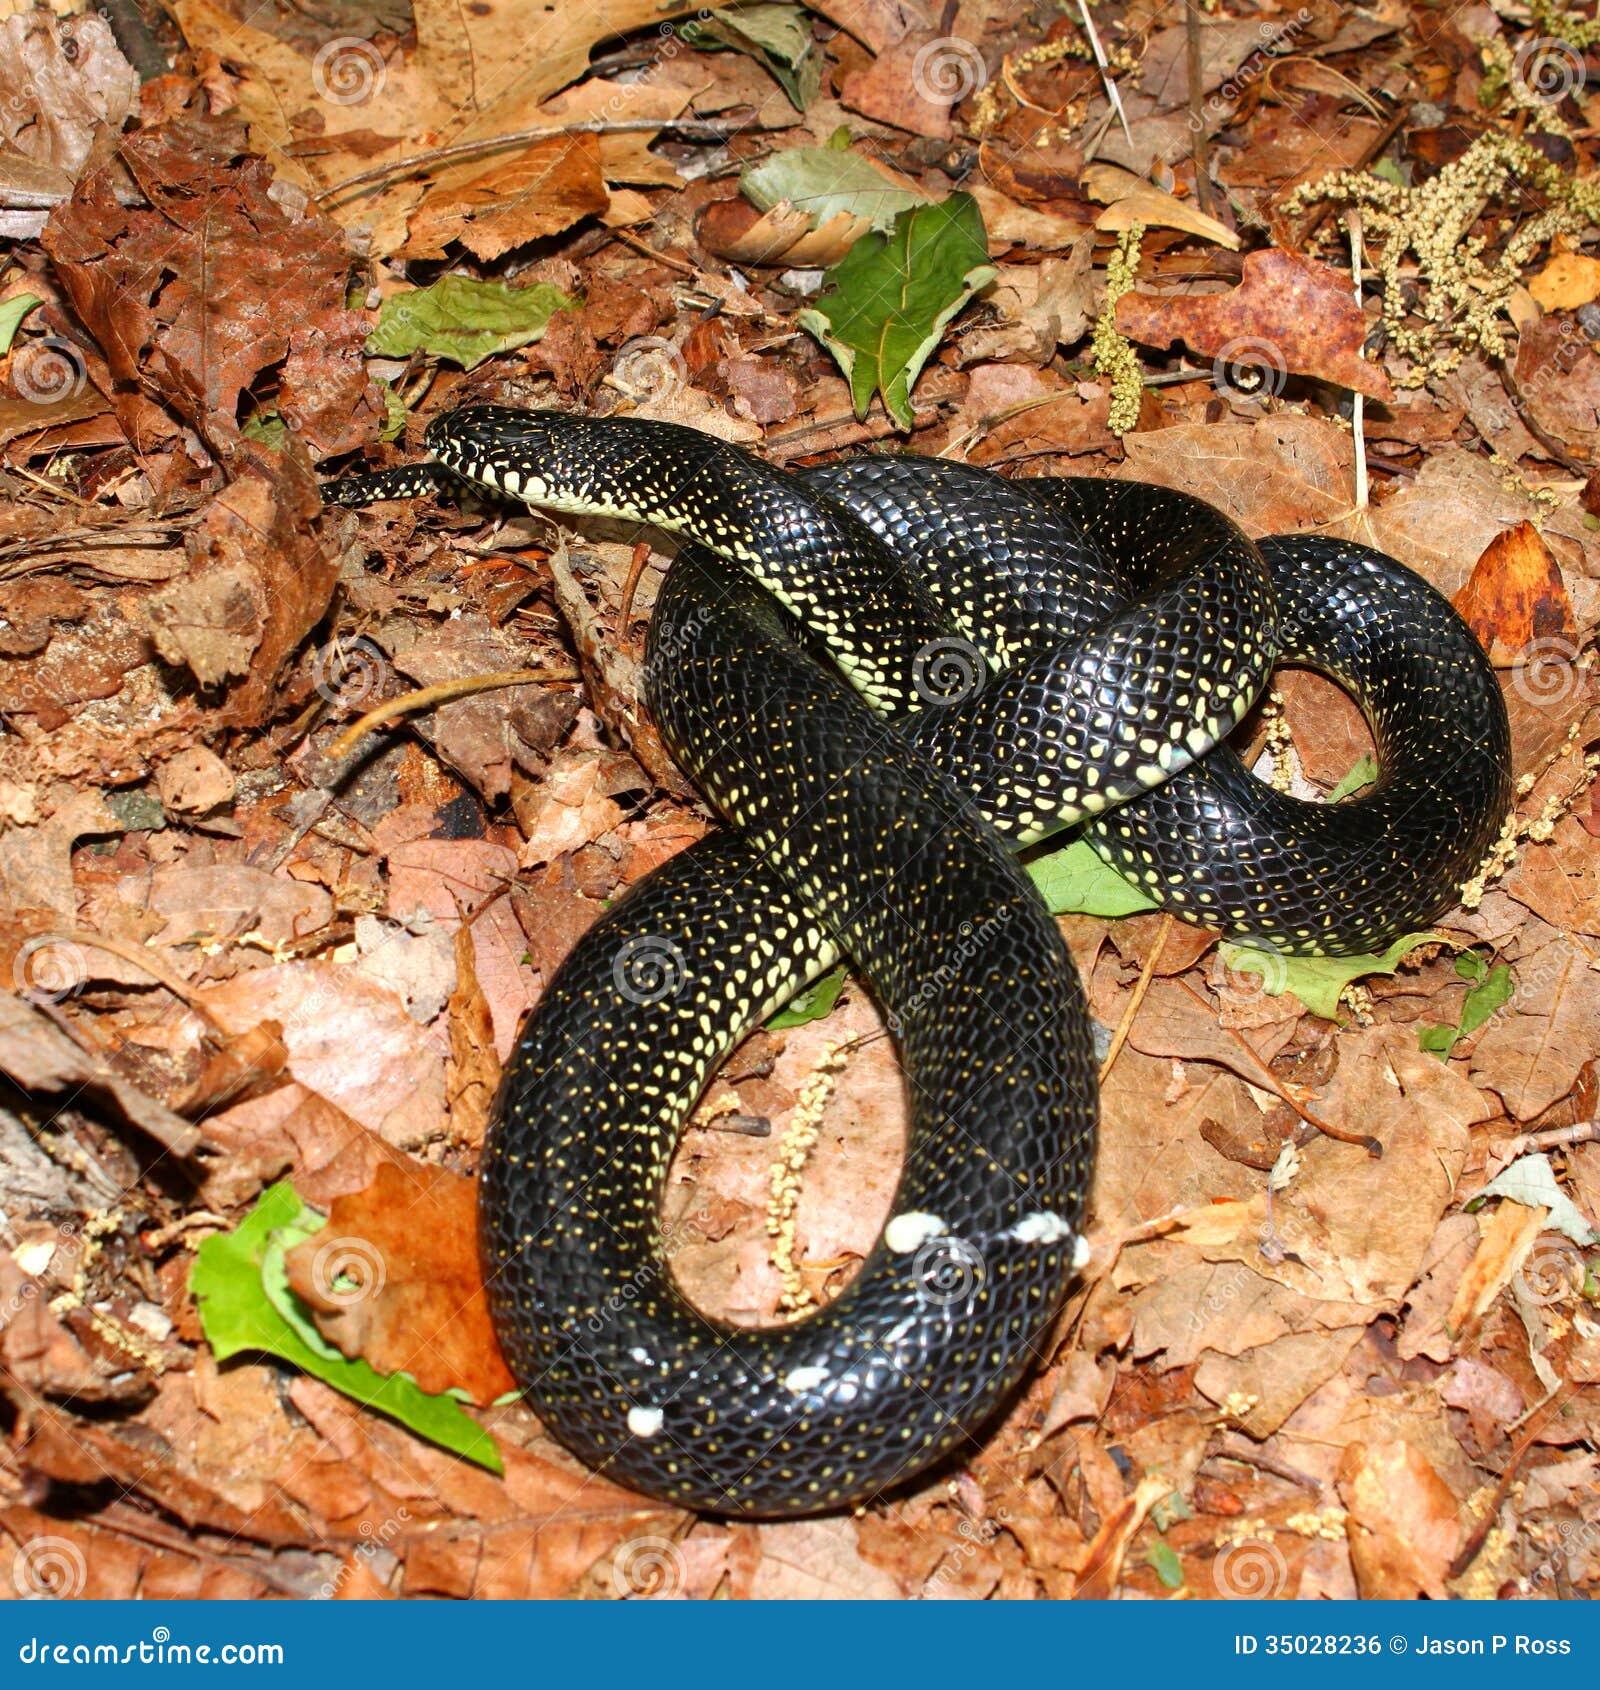 Alabama black snake 5 - 5 7